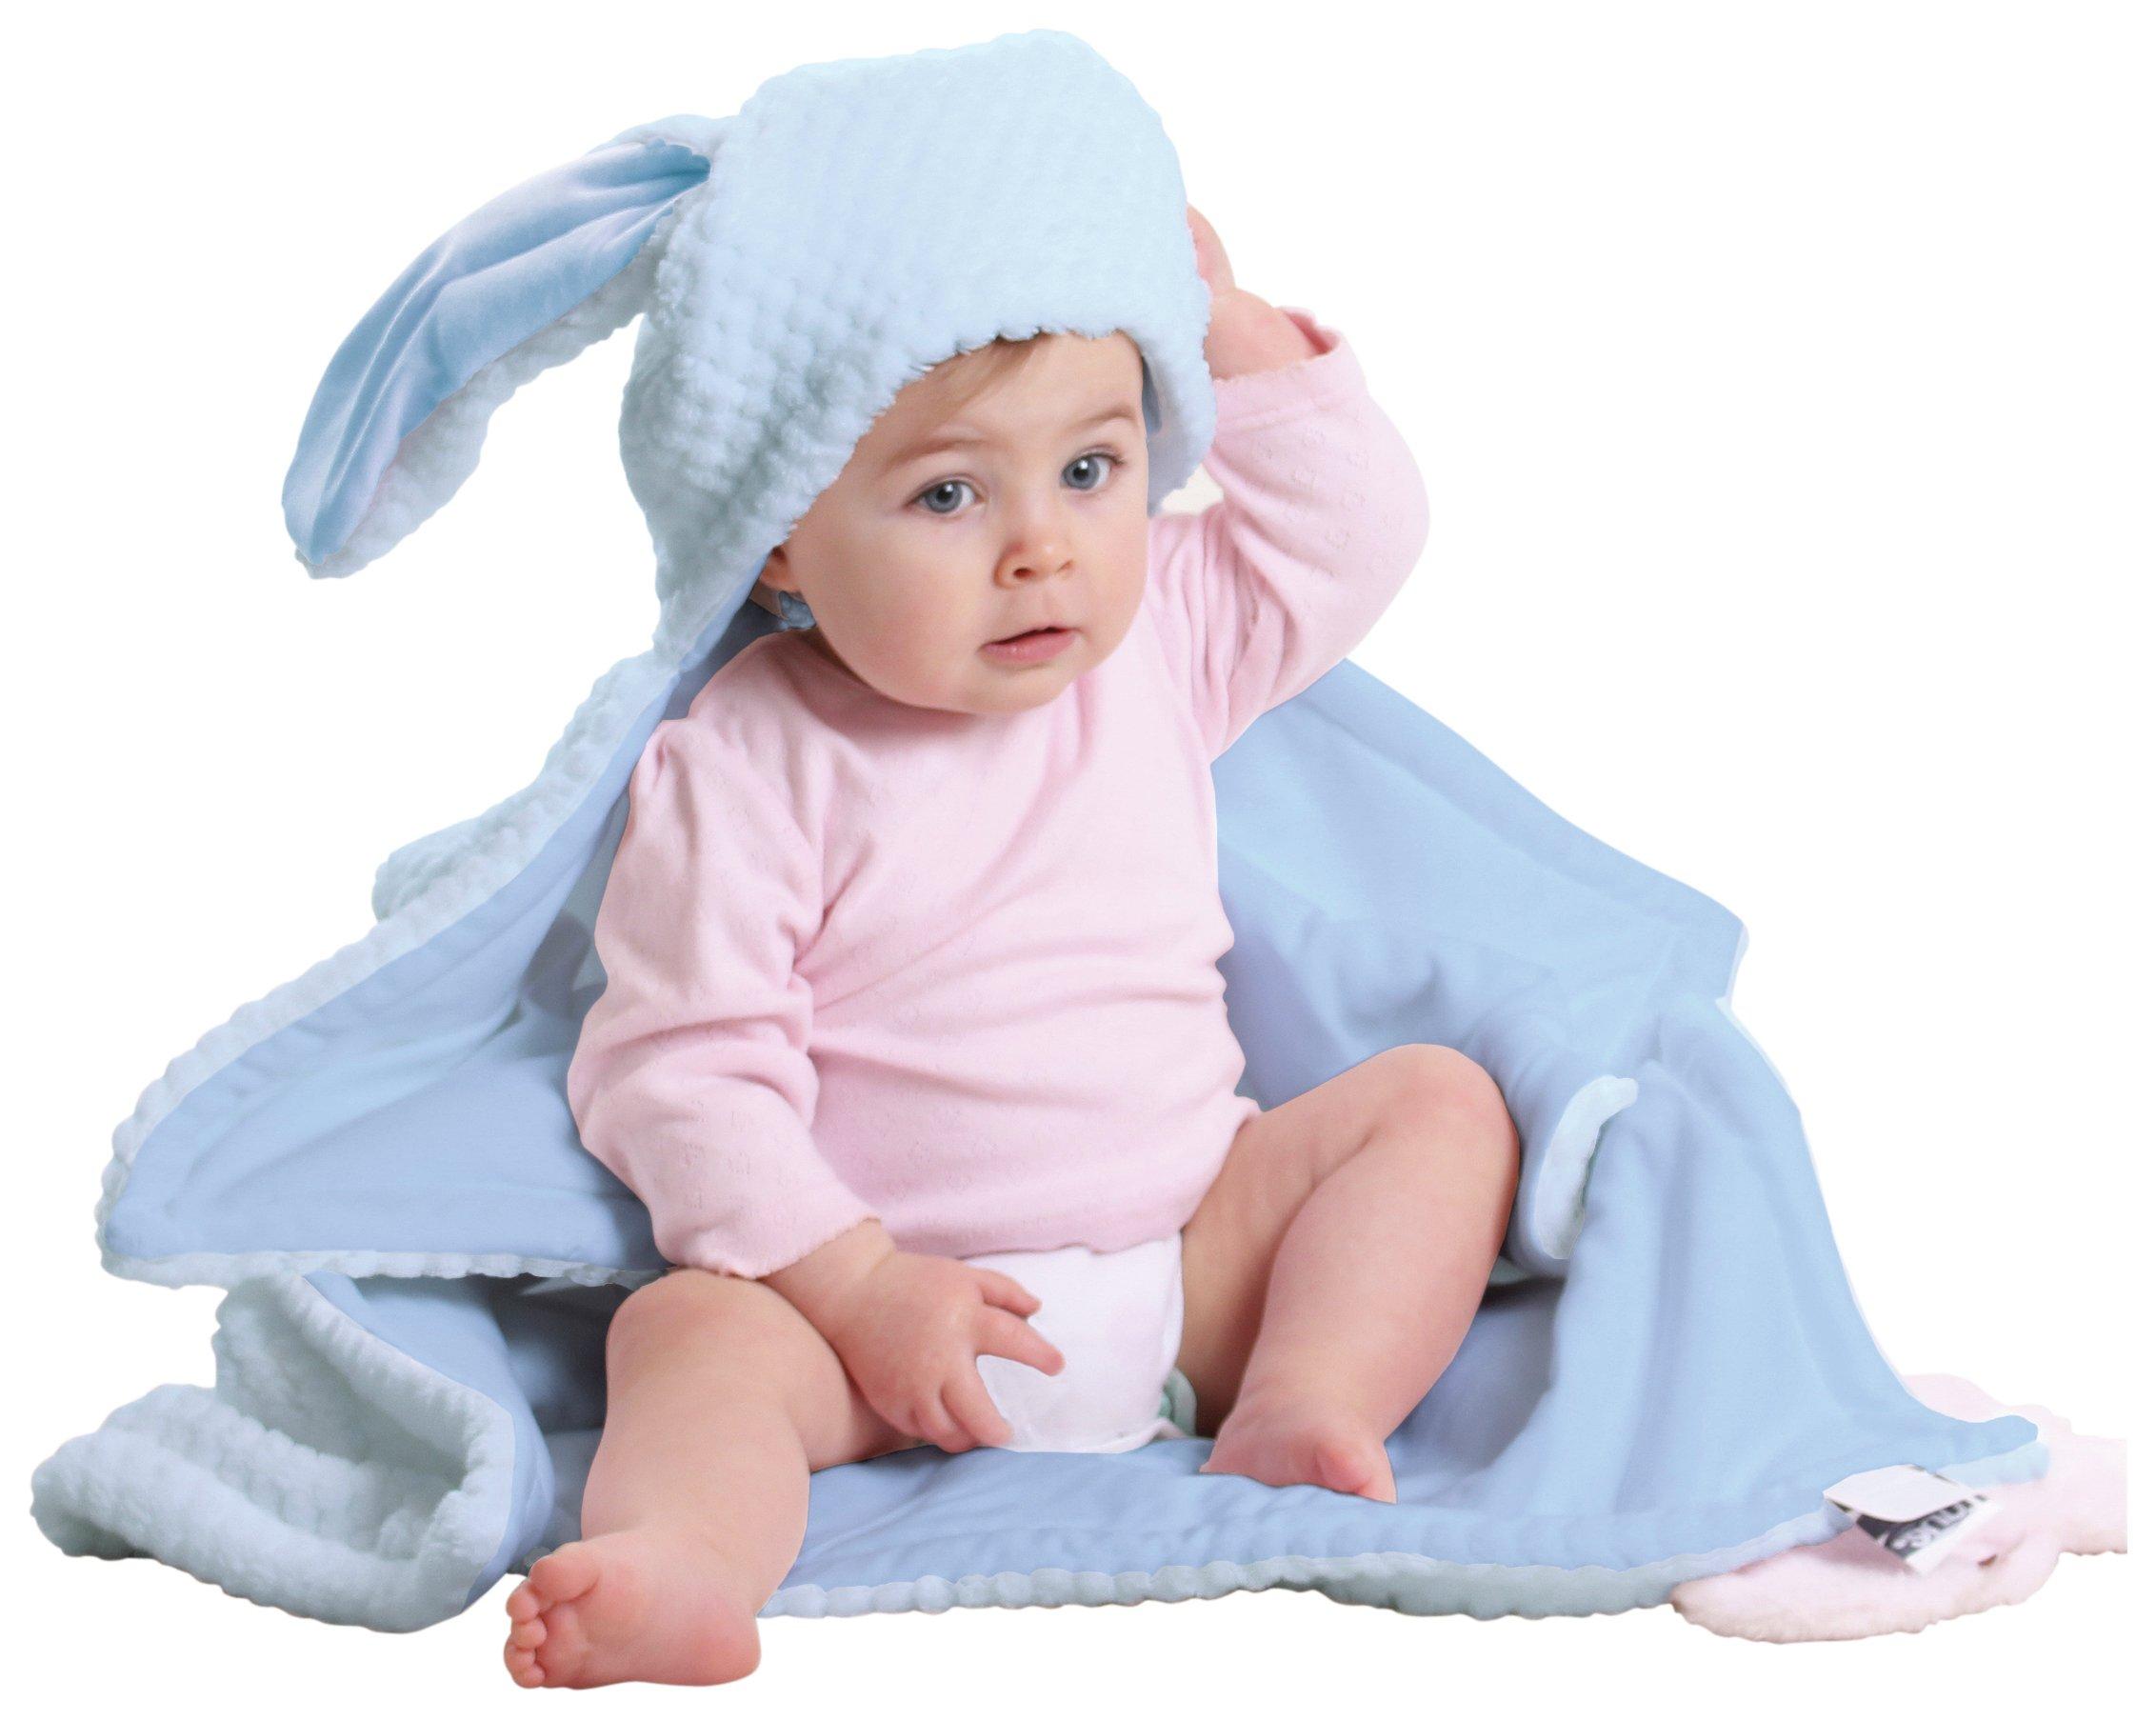 Image of Clair de Lune Honeycomb Hooded Ear Blanket - Blue.